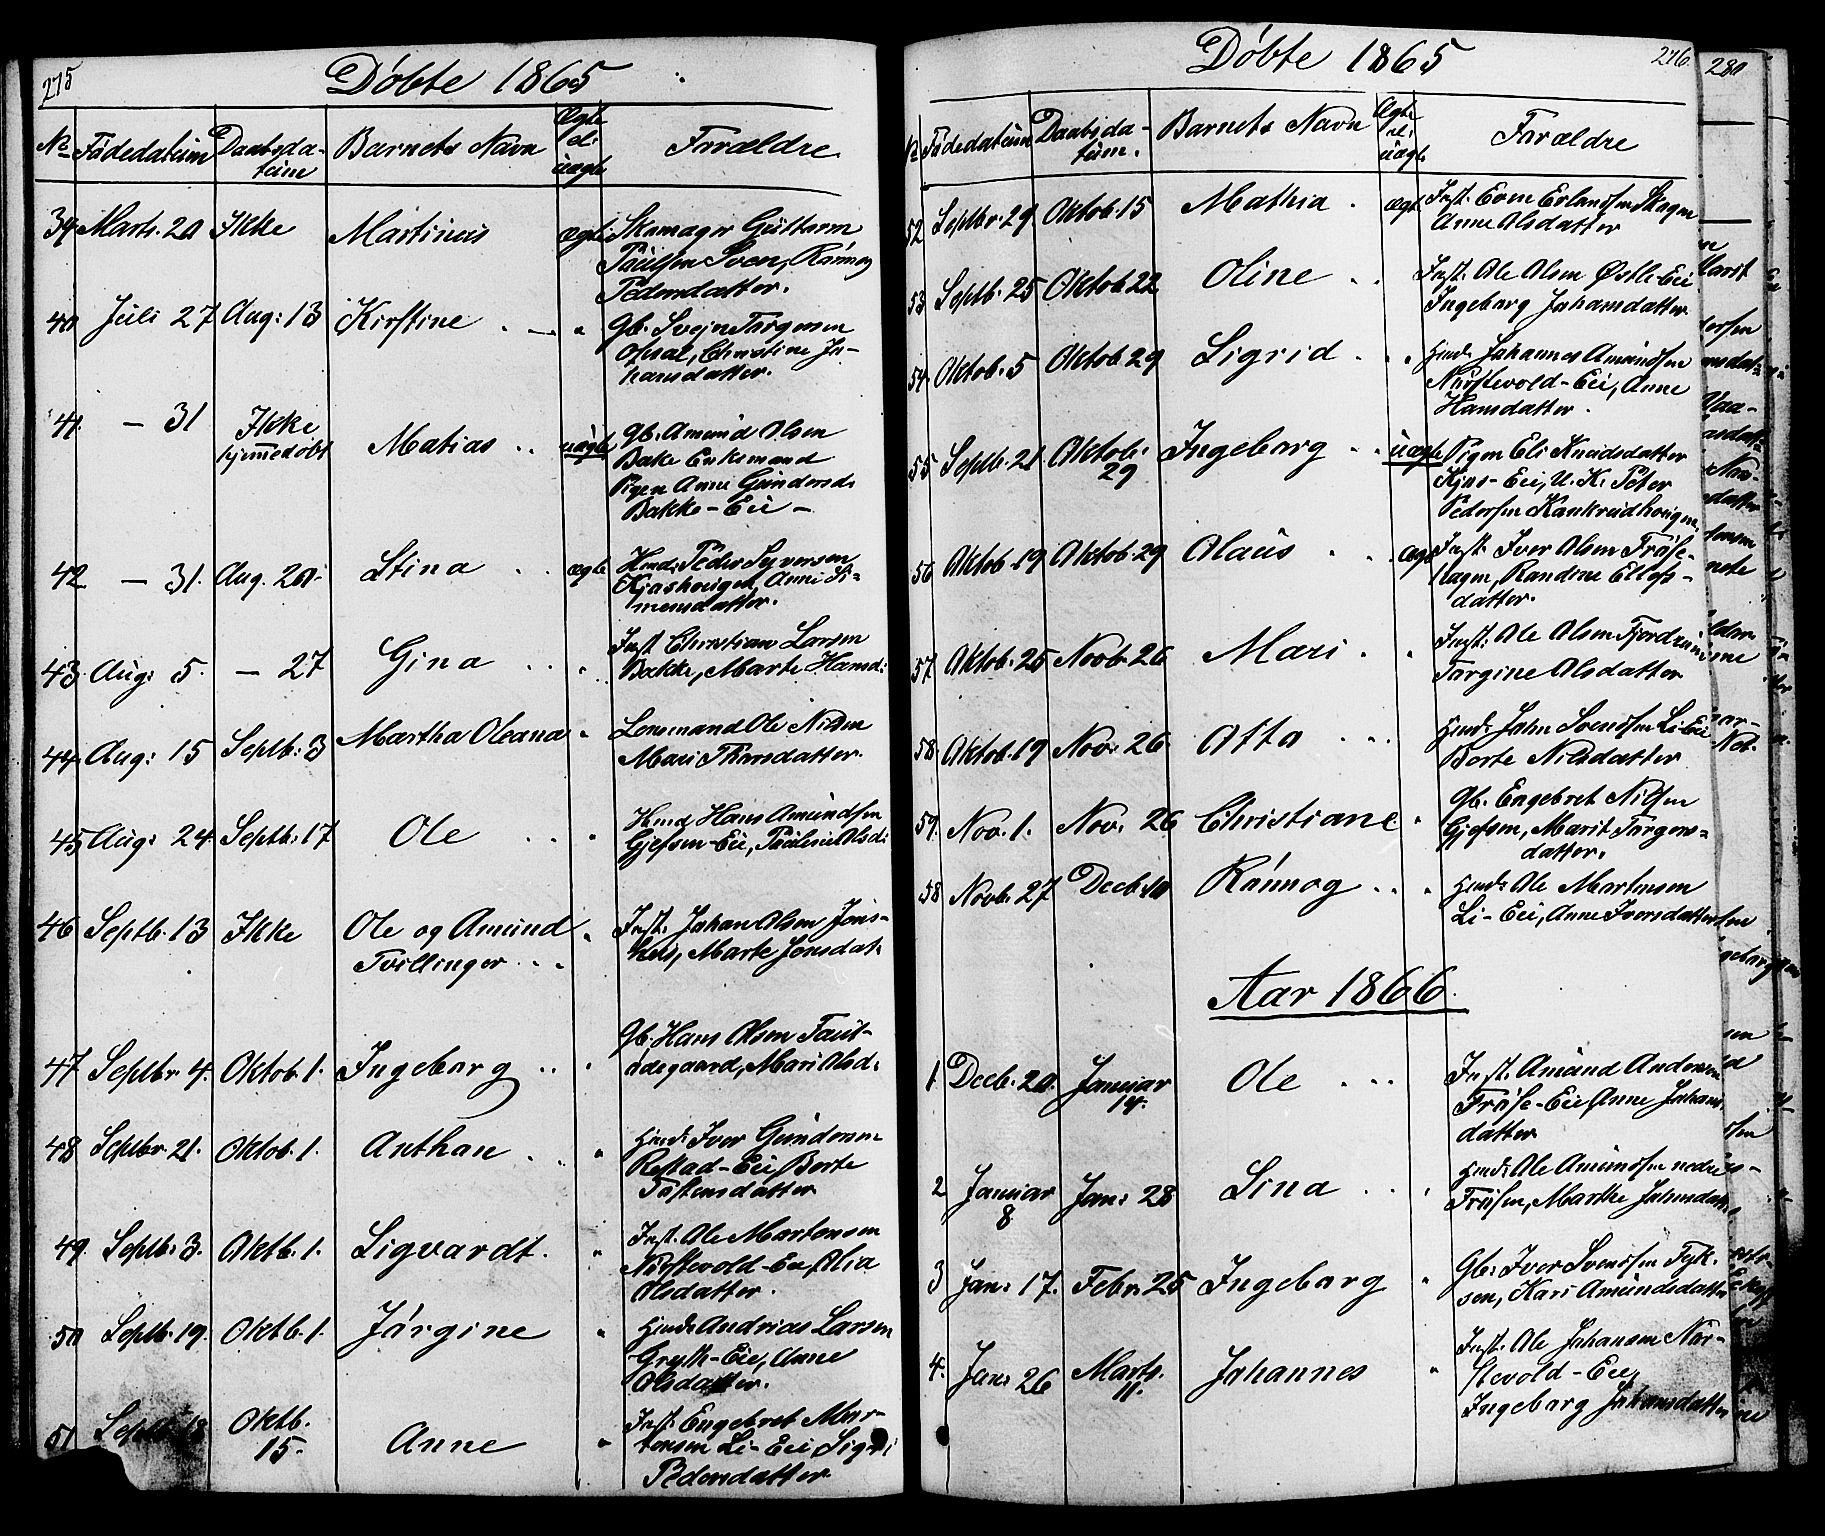 SAH, Østre Gausdal prestekontor, Klokkerbok nr. 1, 1863-1893, s. 275-276